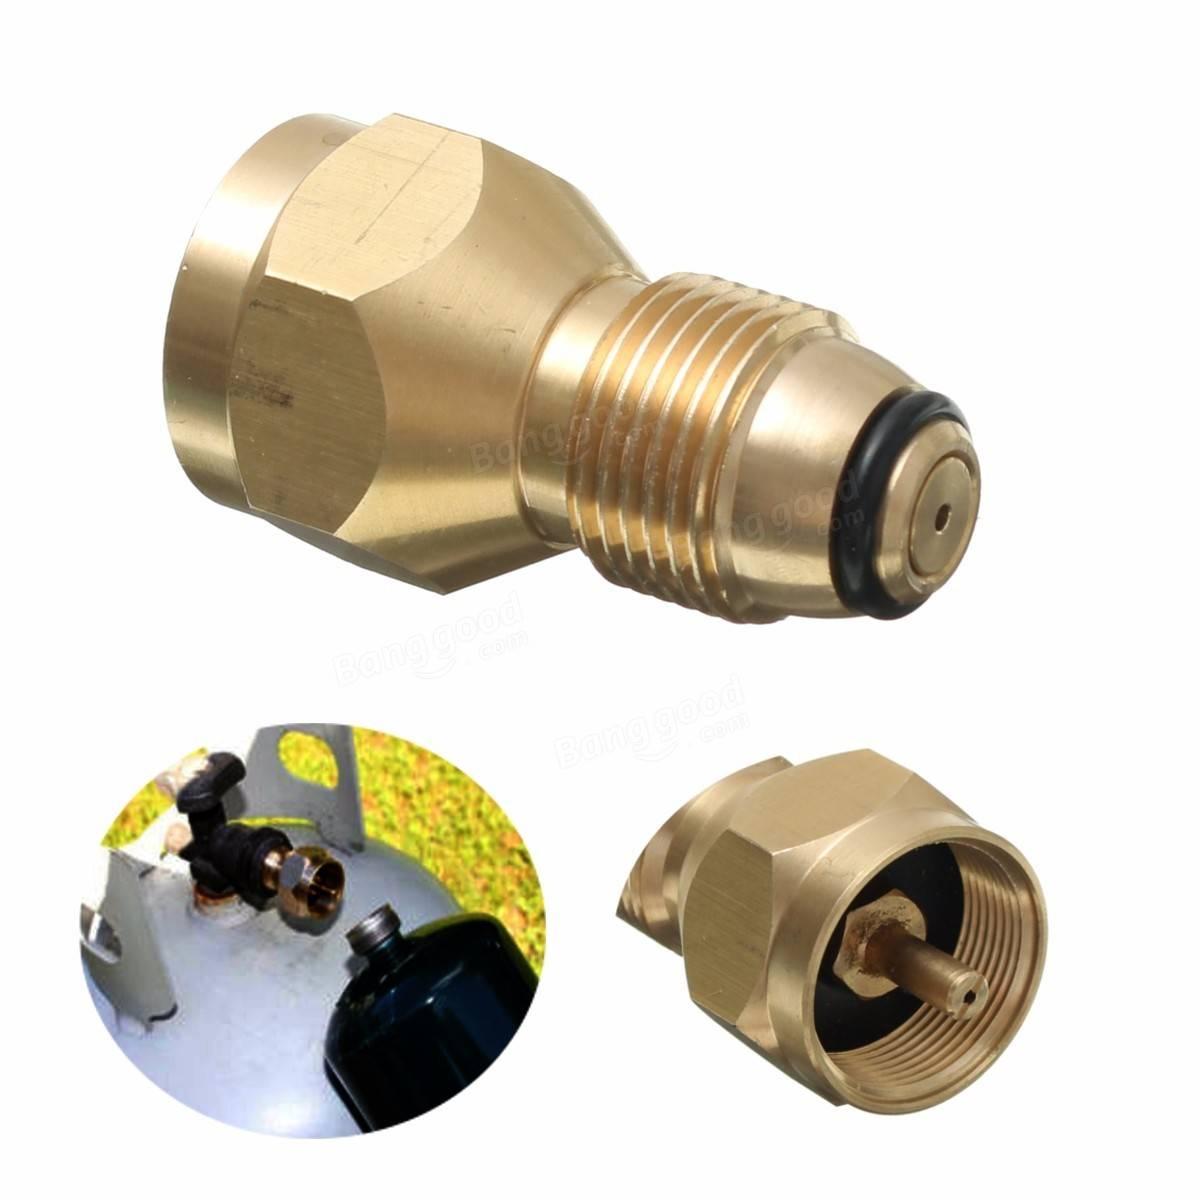 60mm Brass Propane Lp Gas Cylinder Fitting Connector Adapter Sale Banggood Com